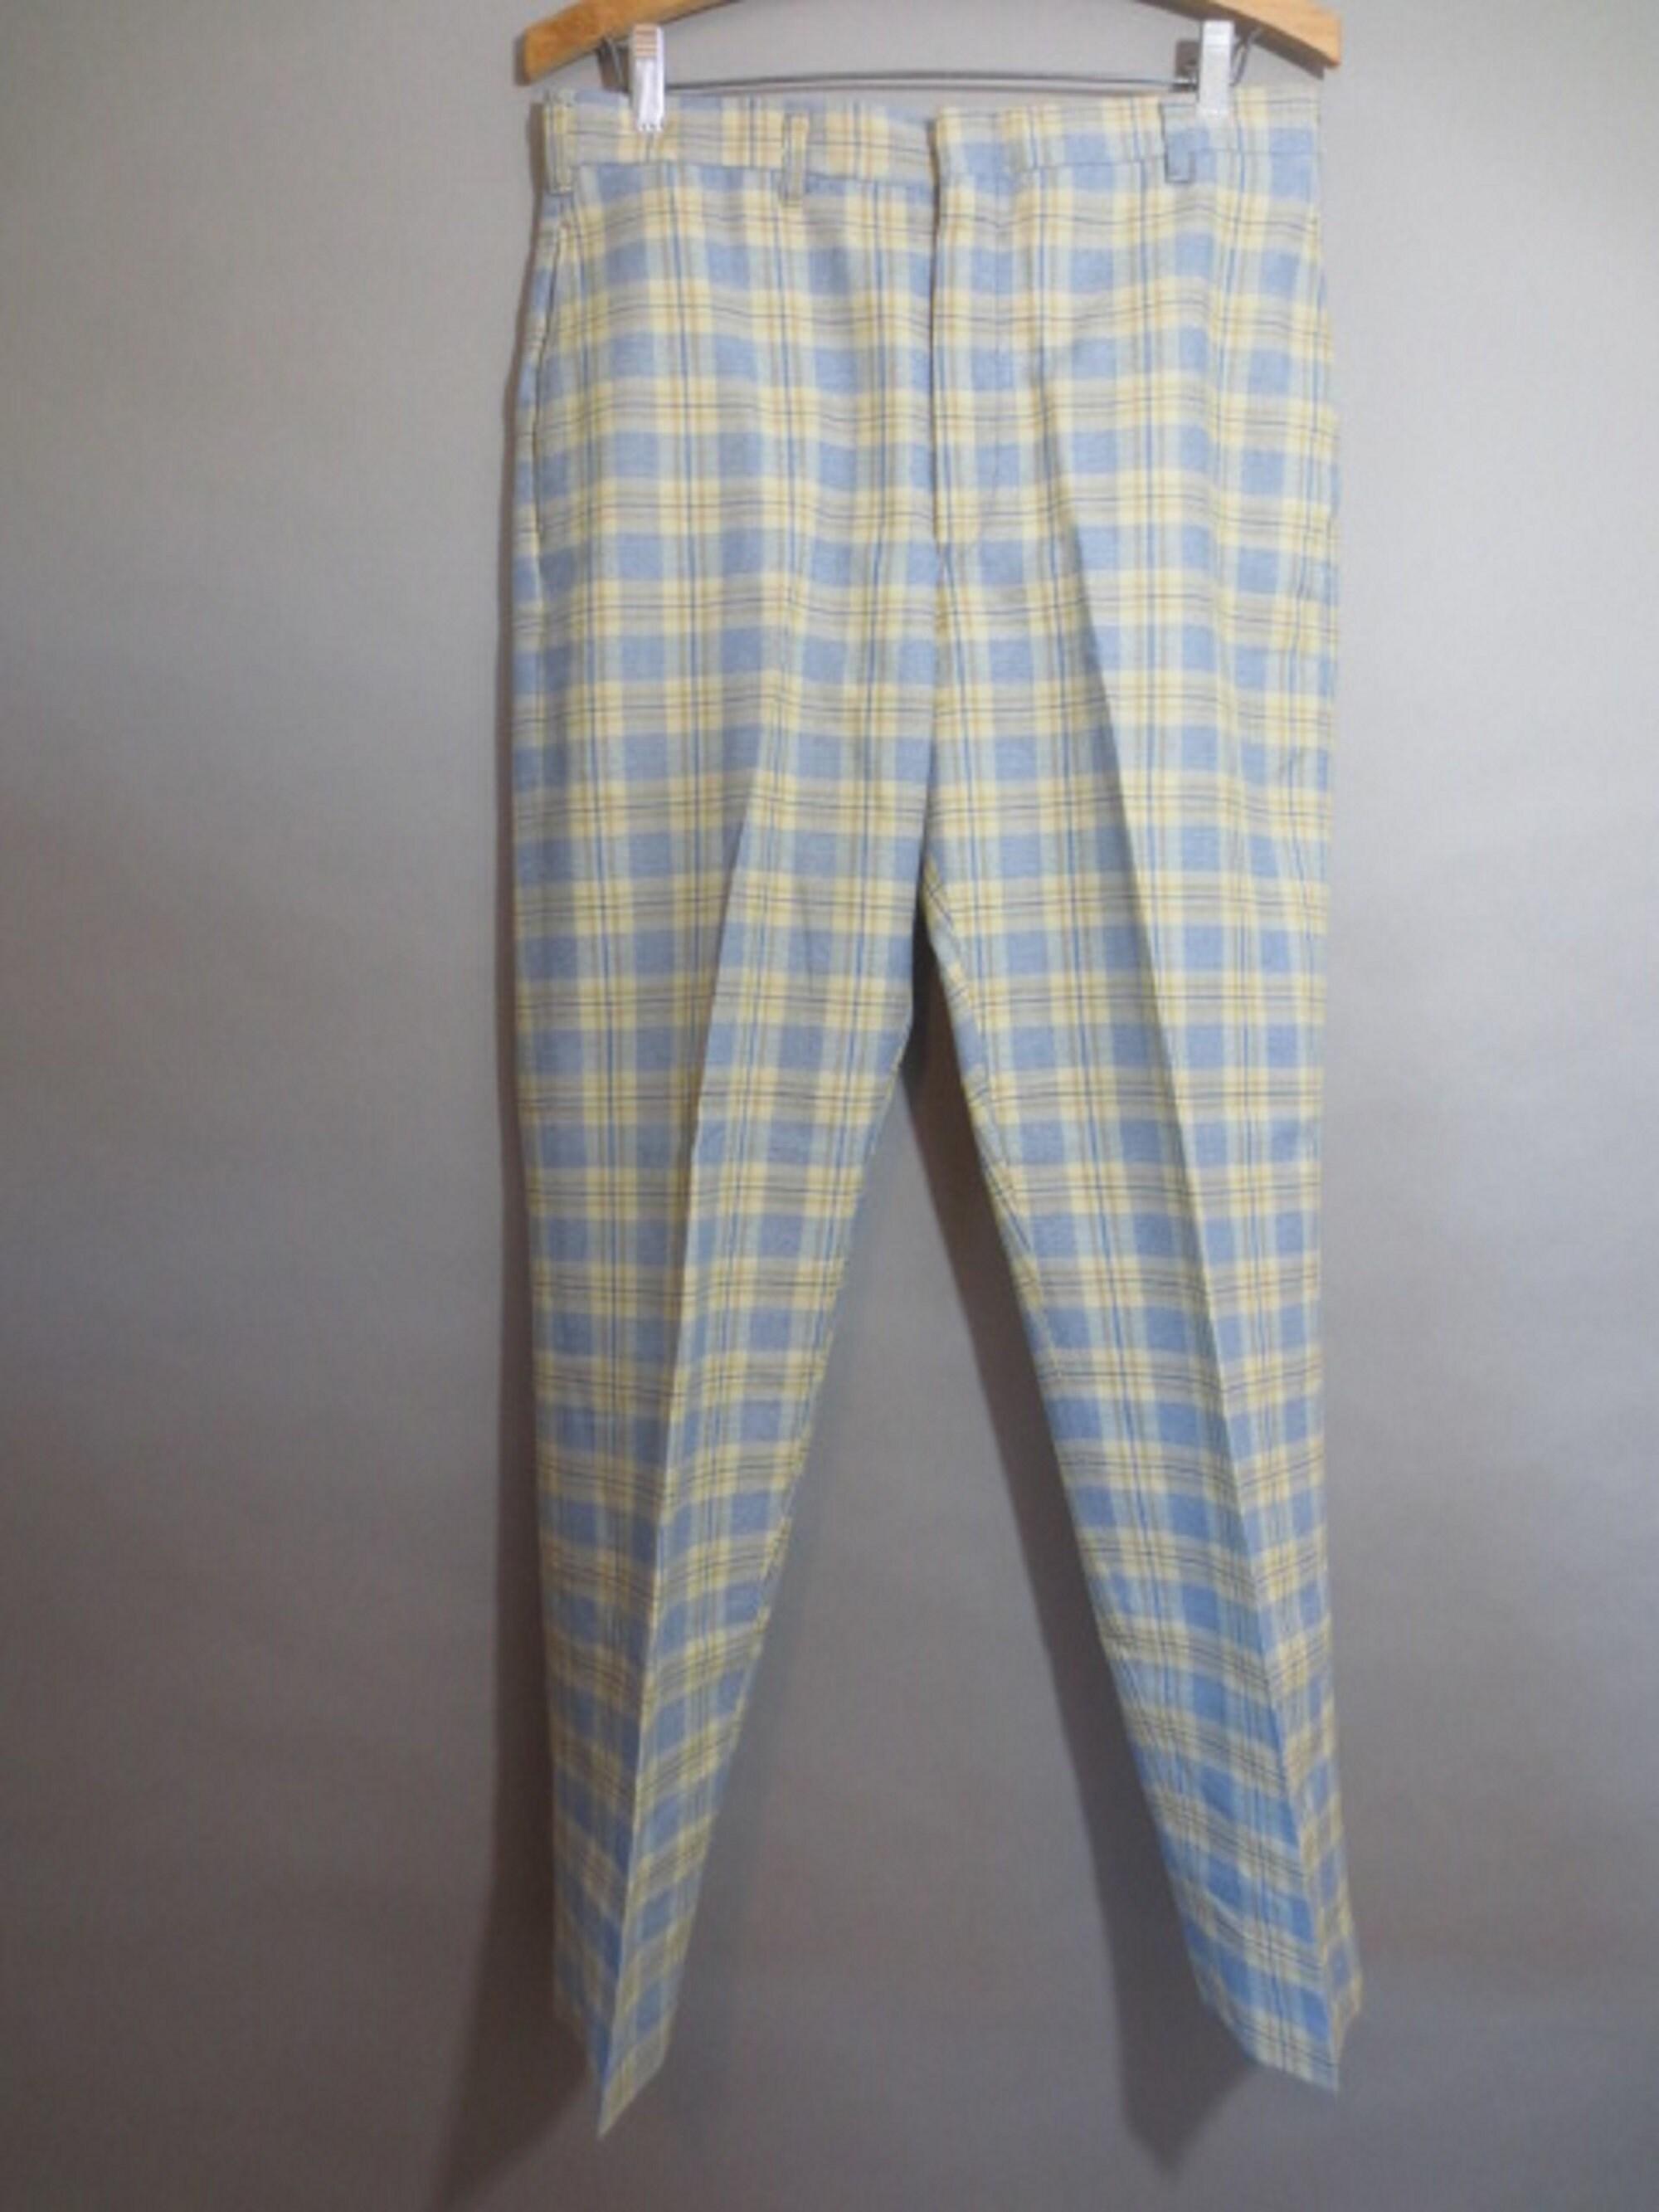 1960s – 70s Men's Ties | Skinny Ties, Slim Ties Vintage 1960s Levis Pants, Young Mens Sta-Prest Pants, Plaid, Tapered Legs, Side Slit Pockets, Belt Loops, Good Condition...31 X 28 12 $35.00 AT vintagedancer.com